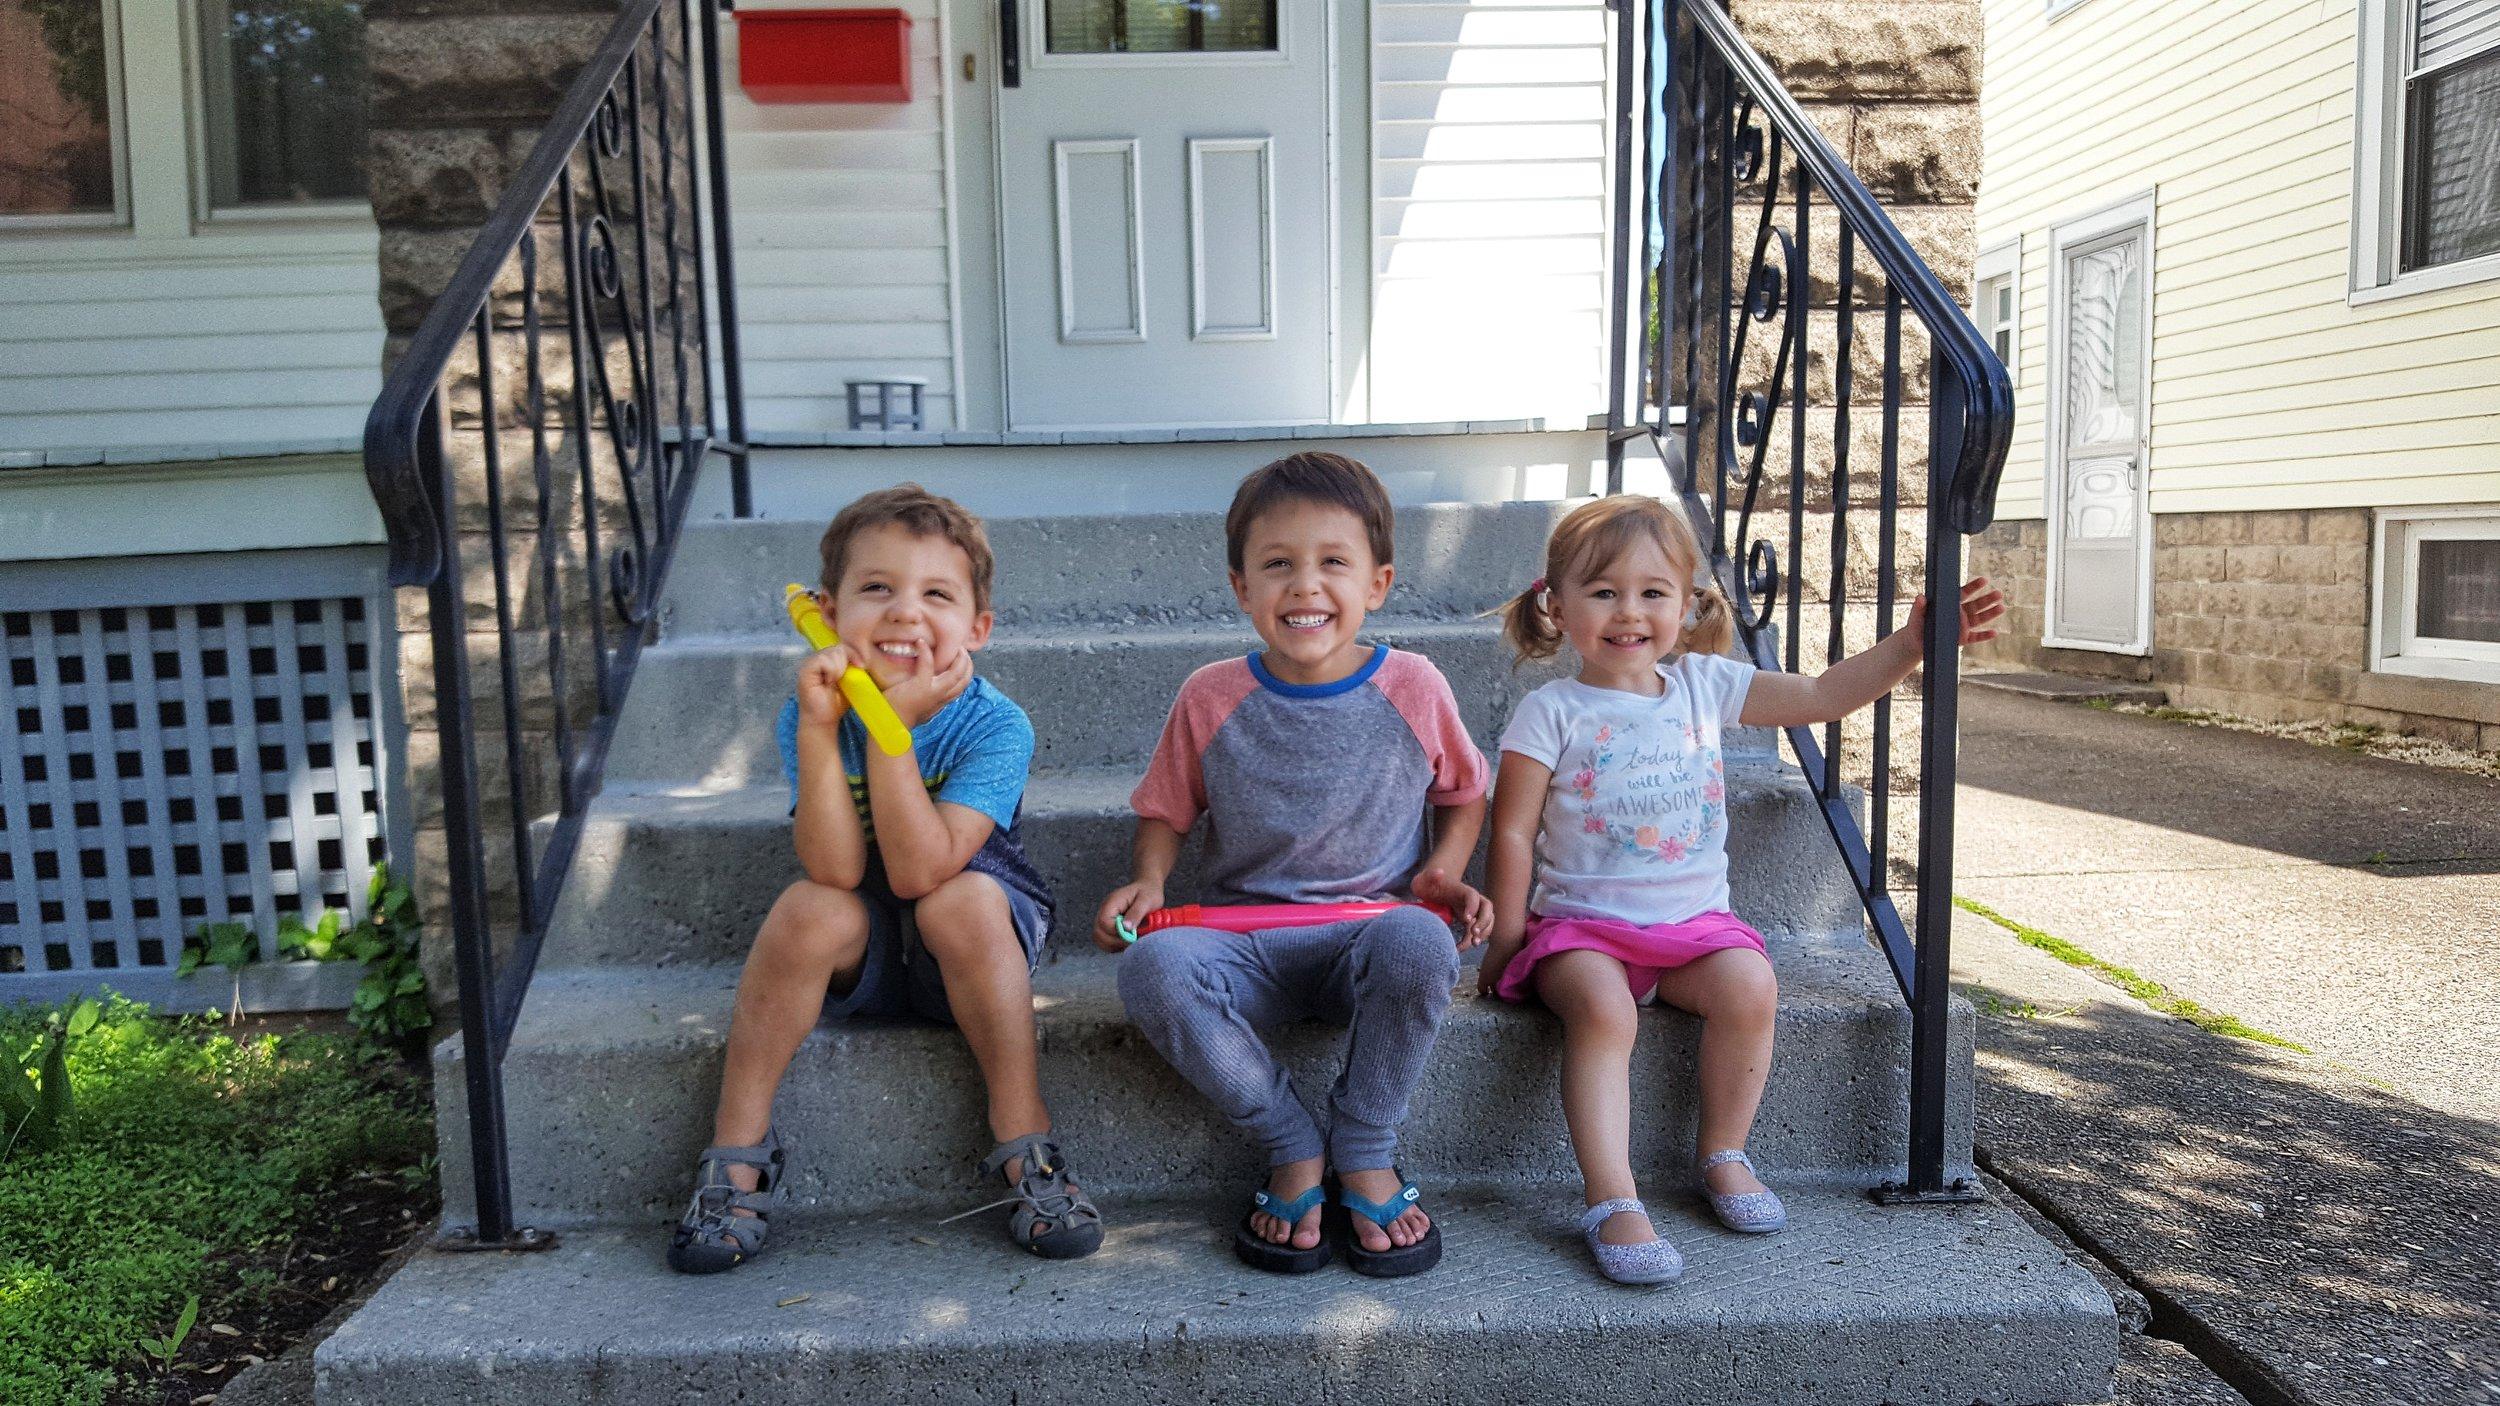 Cousins in Sandusky Ohio - Reid, Bennett, and Penelope